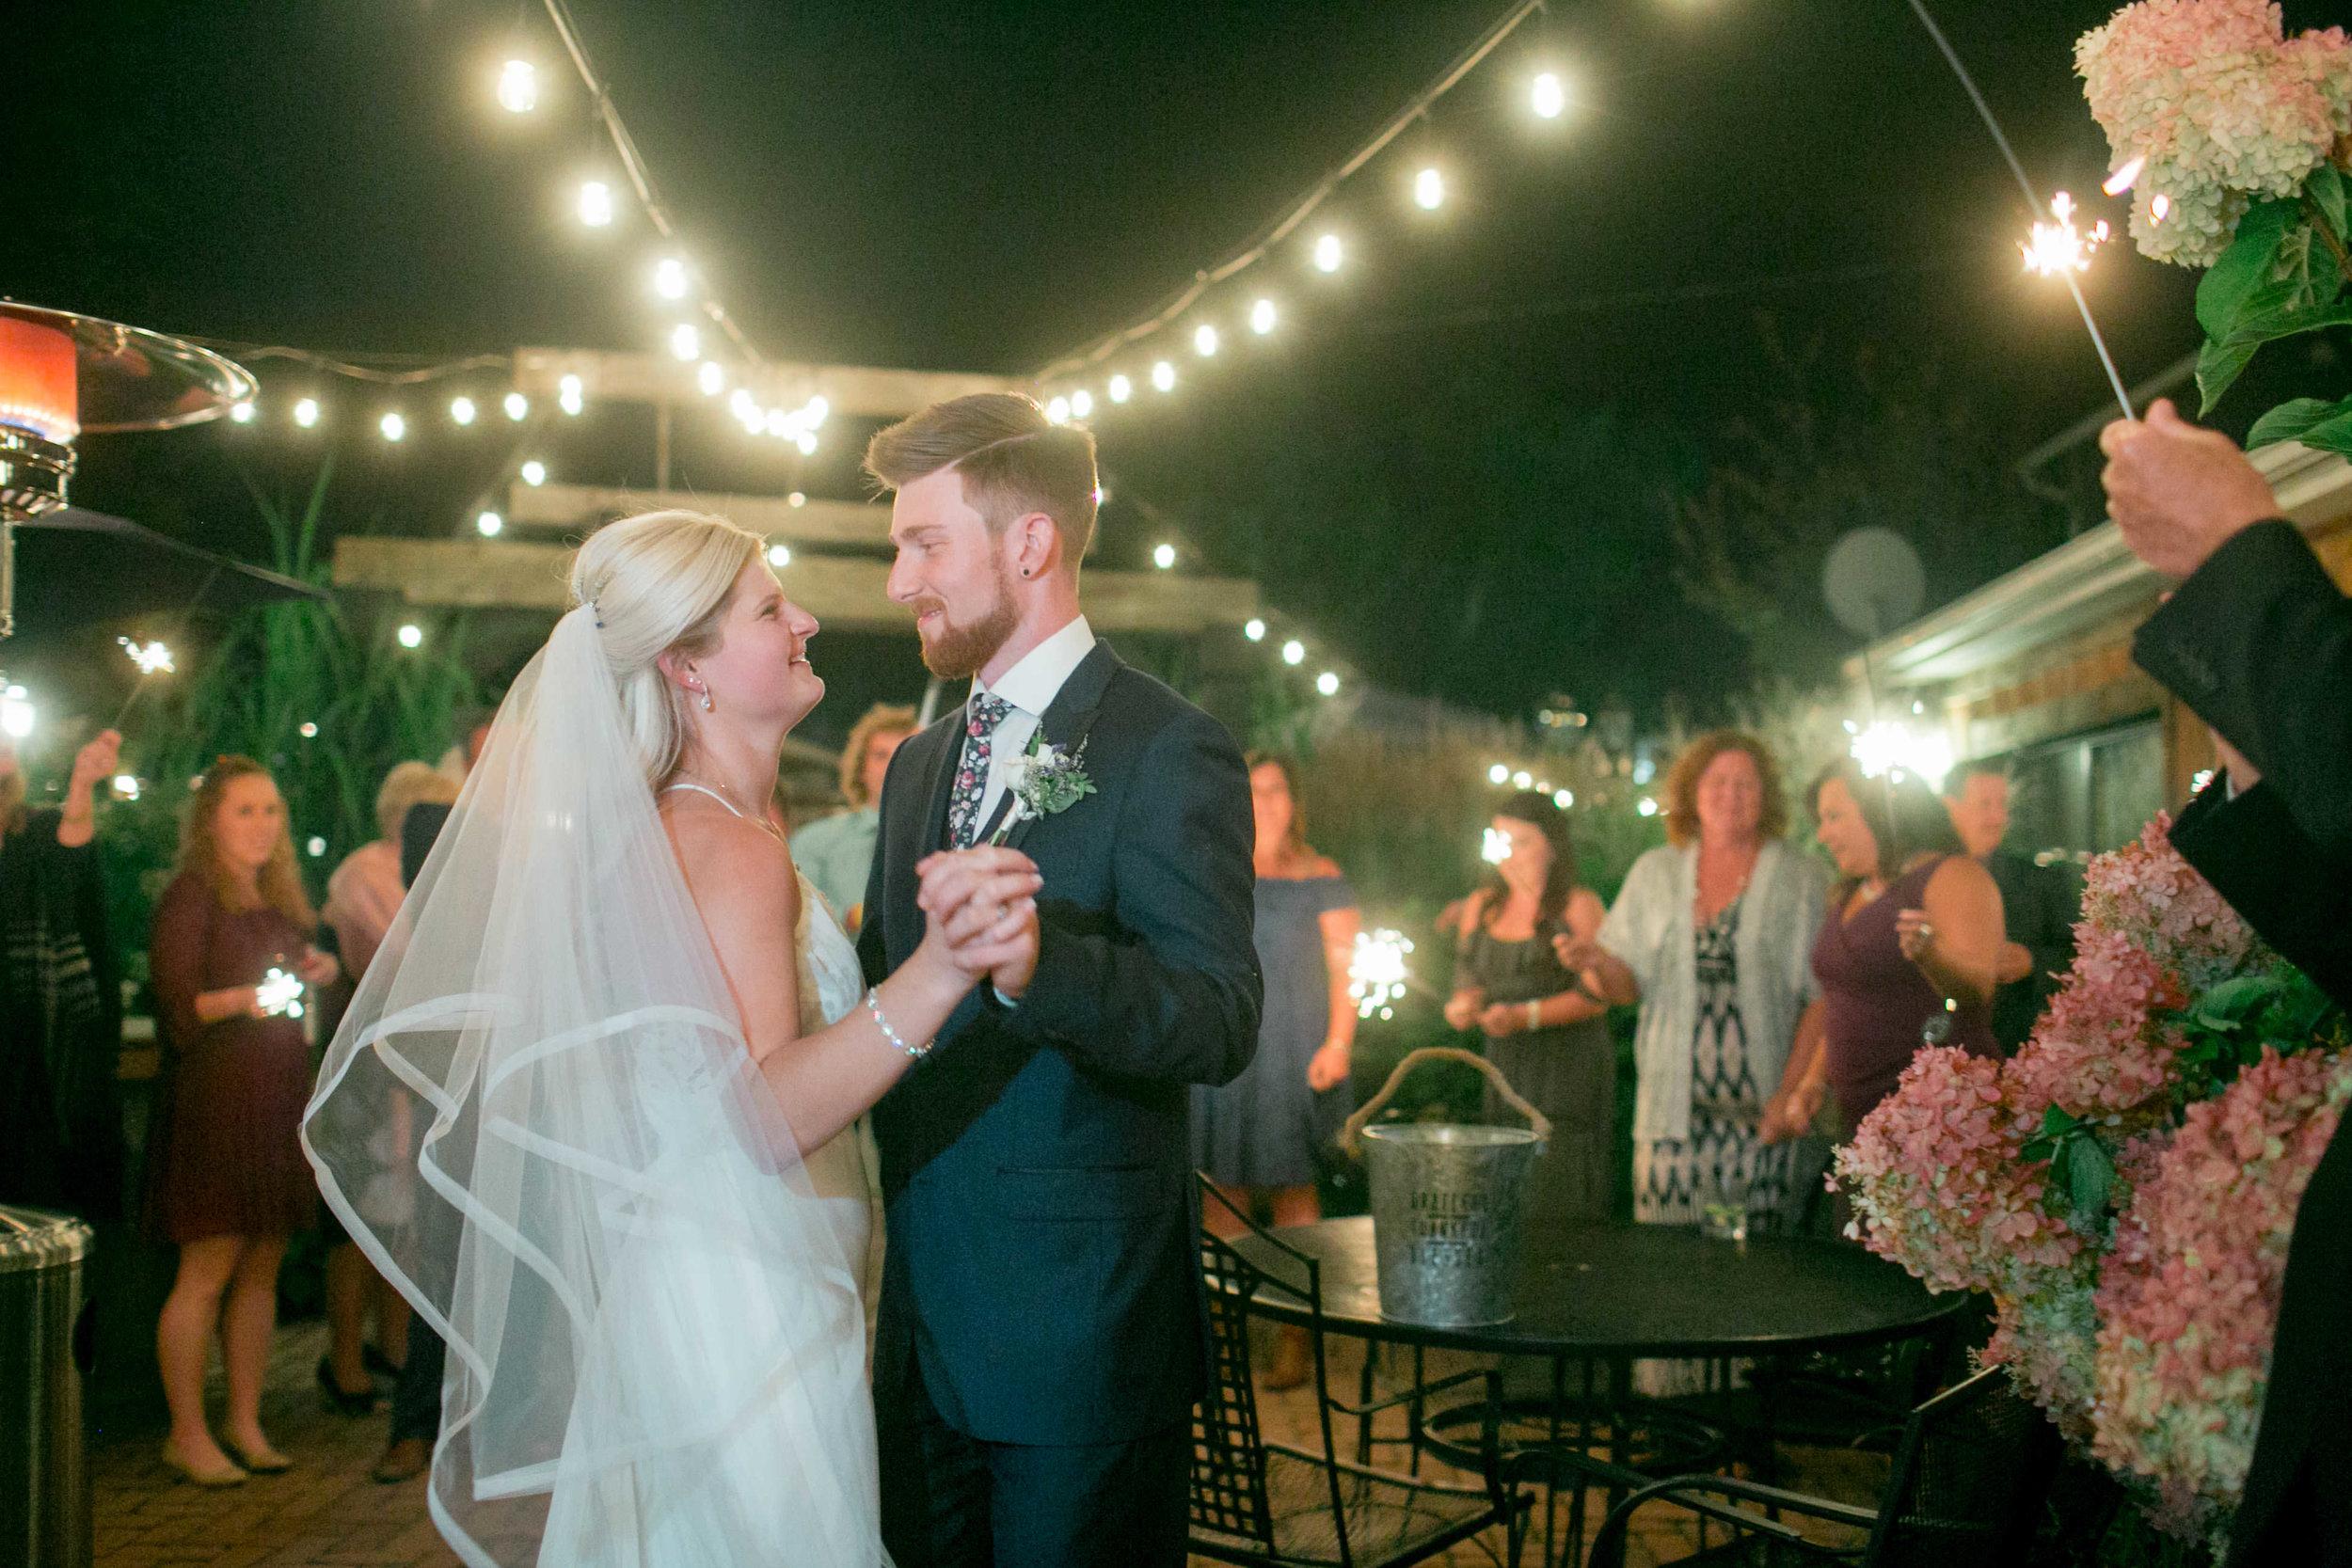 Maddy___Brandon___Daniel_Ricci_Weddings_High_Res._Finals_666.jpg